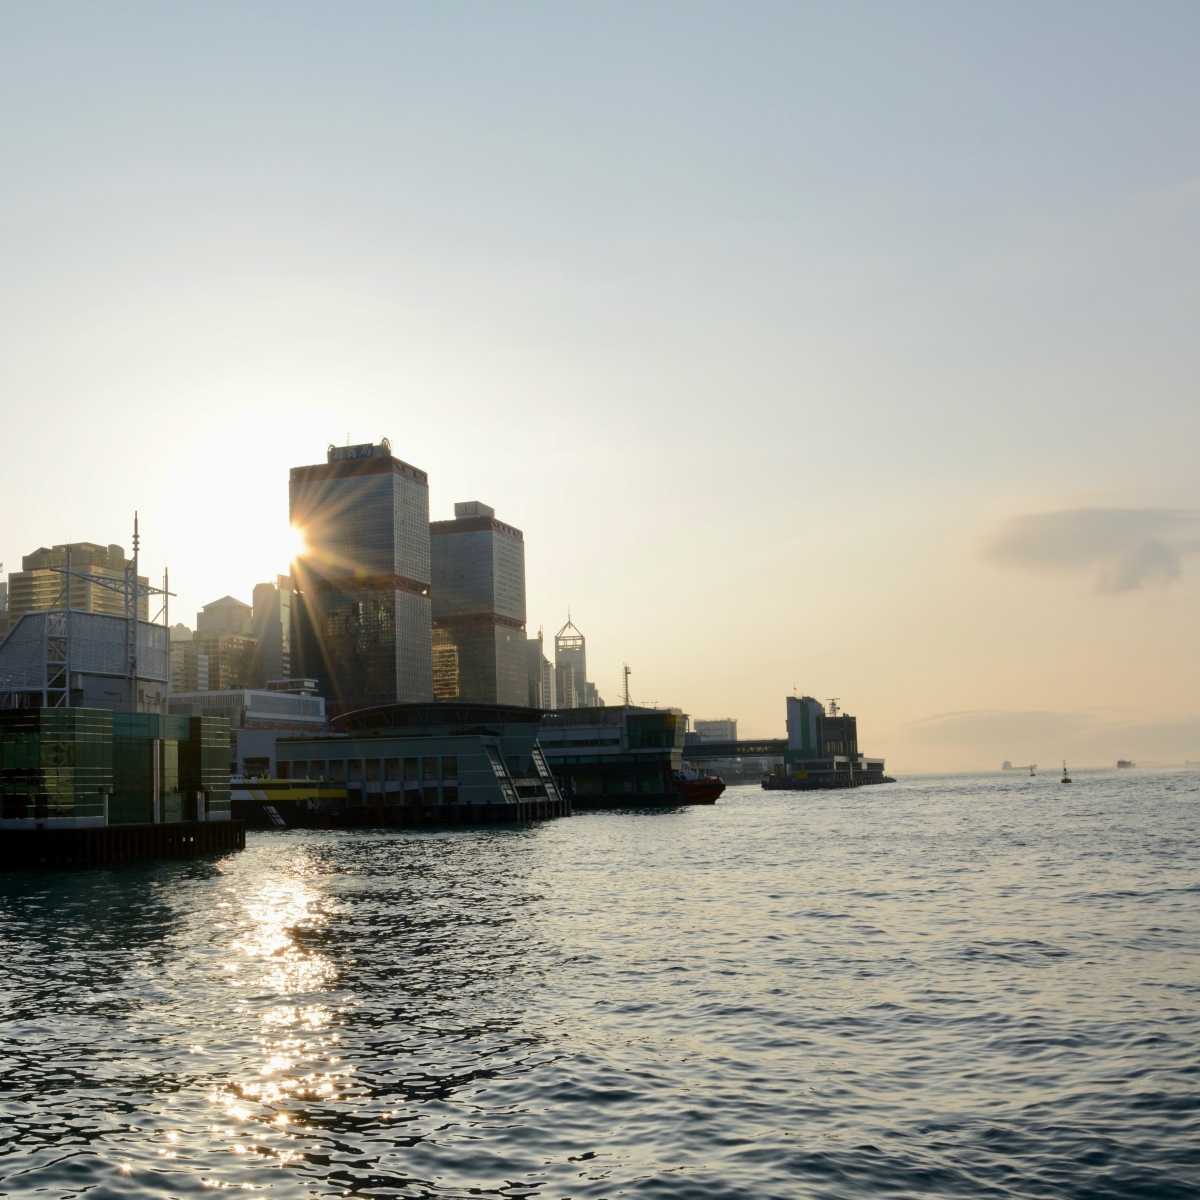 Lamma Island, Hong Kong | A Hike along the Island's Family Trail …continued